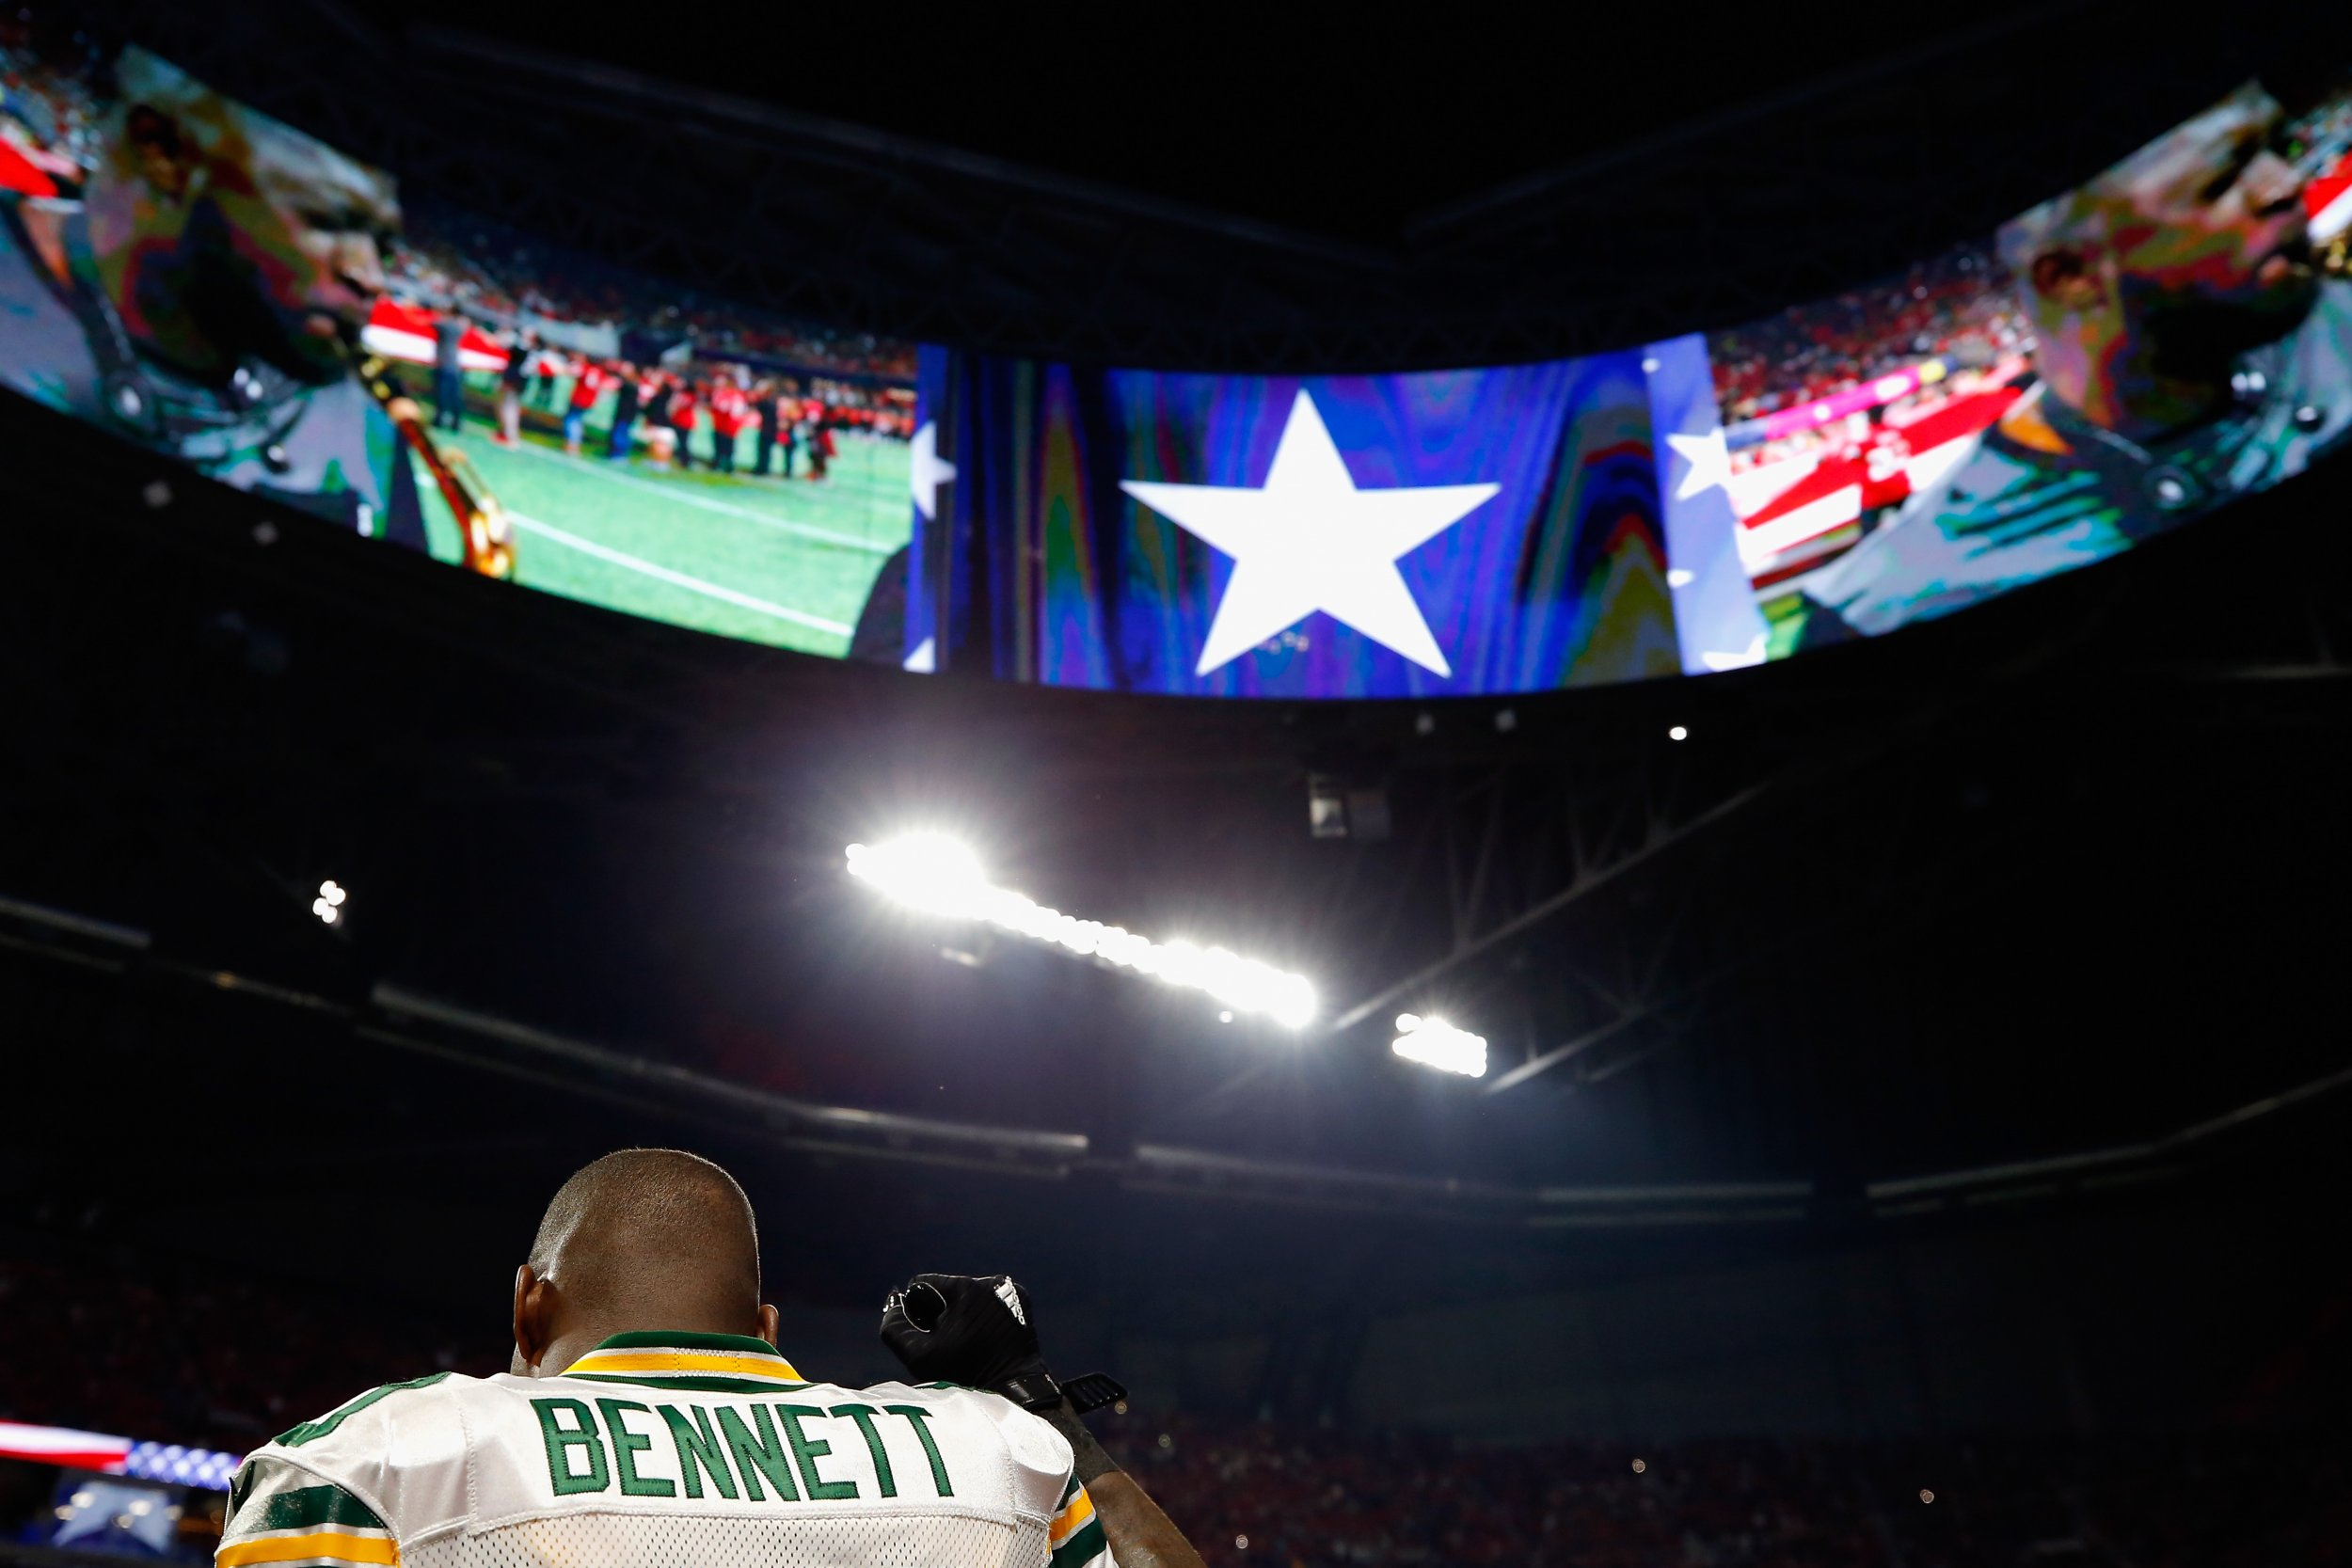 Martellus Bennett of the Green Bay Packers at Mercedes-Benz Stadium, Atlanta, September 17.